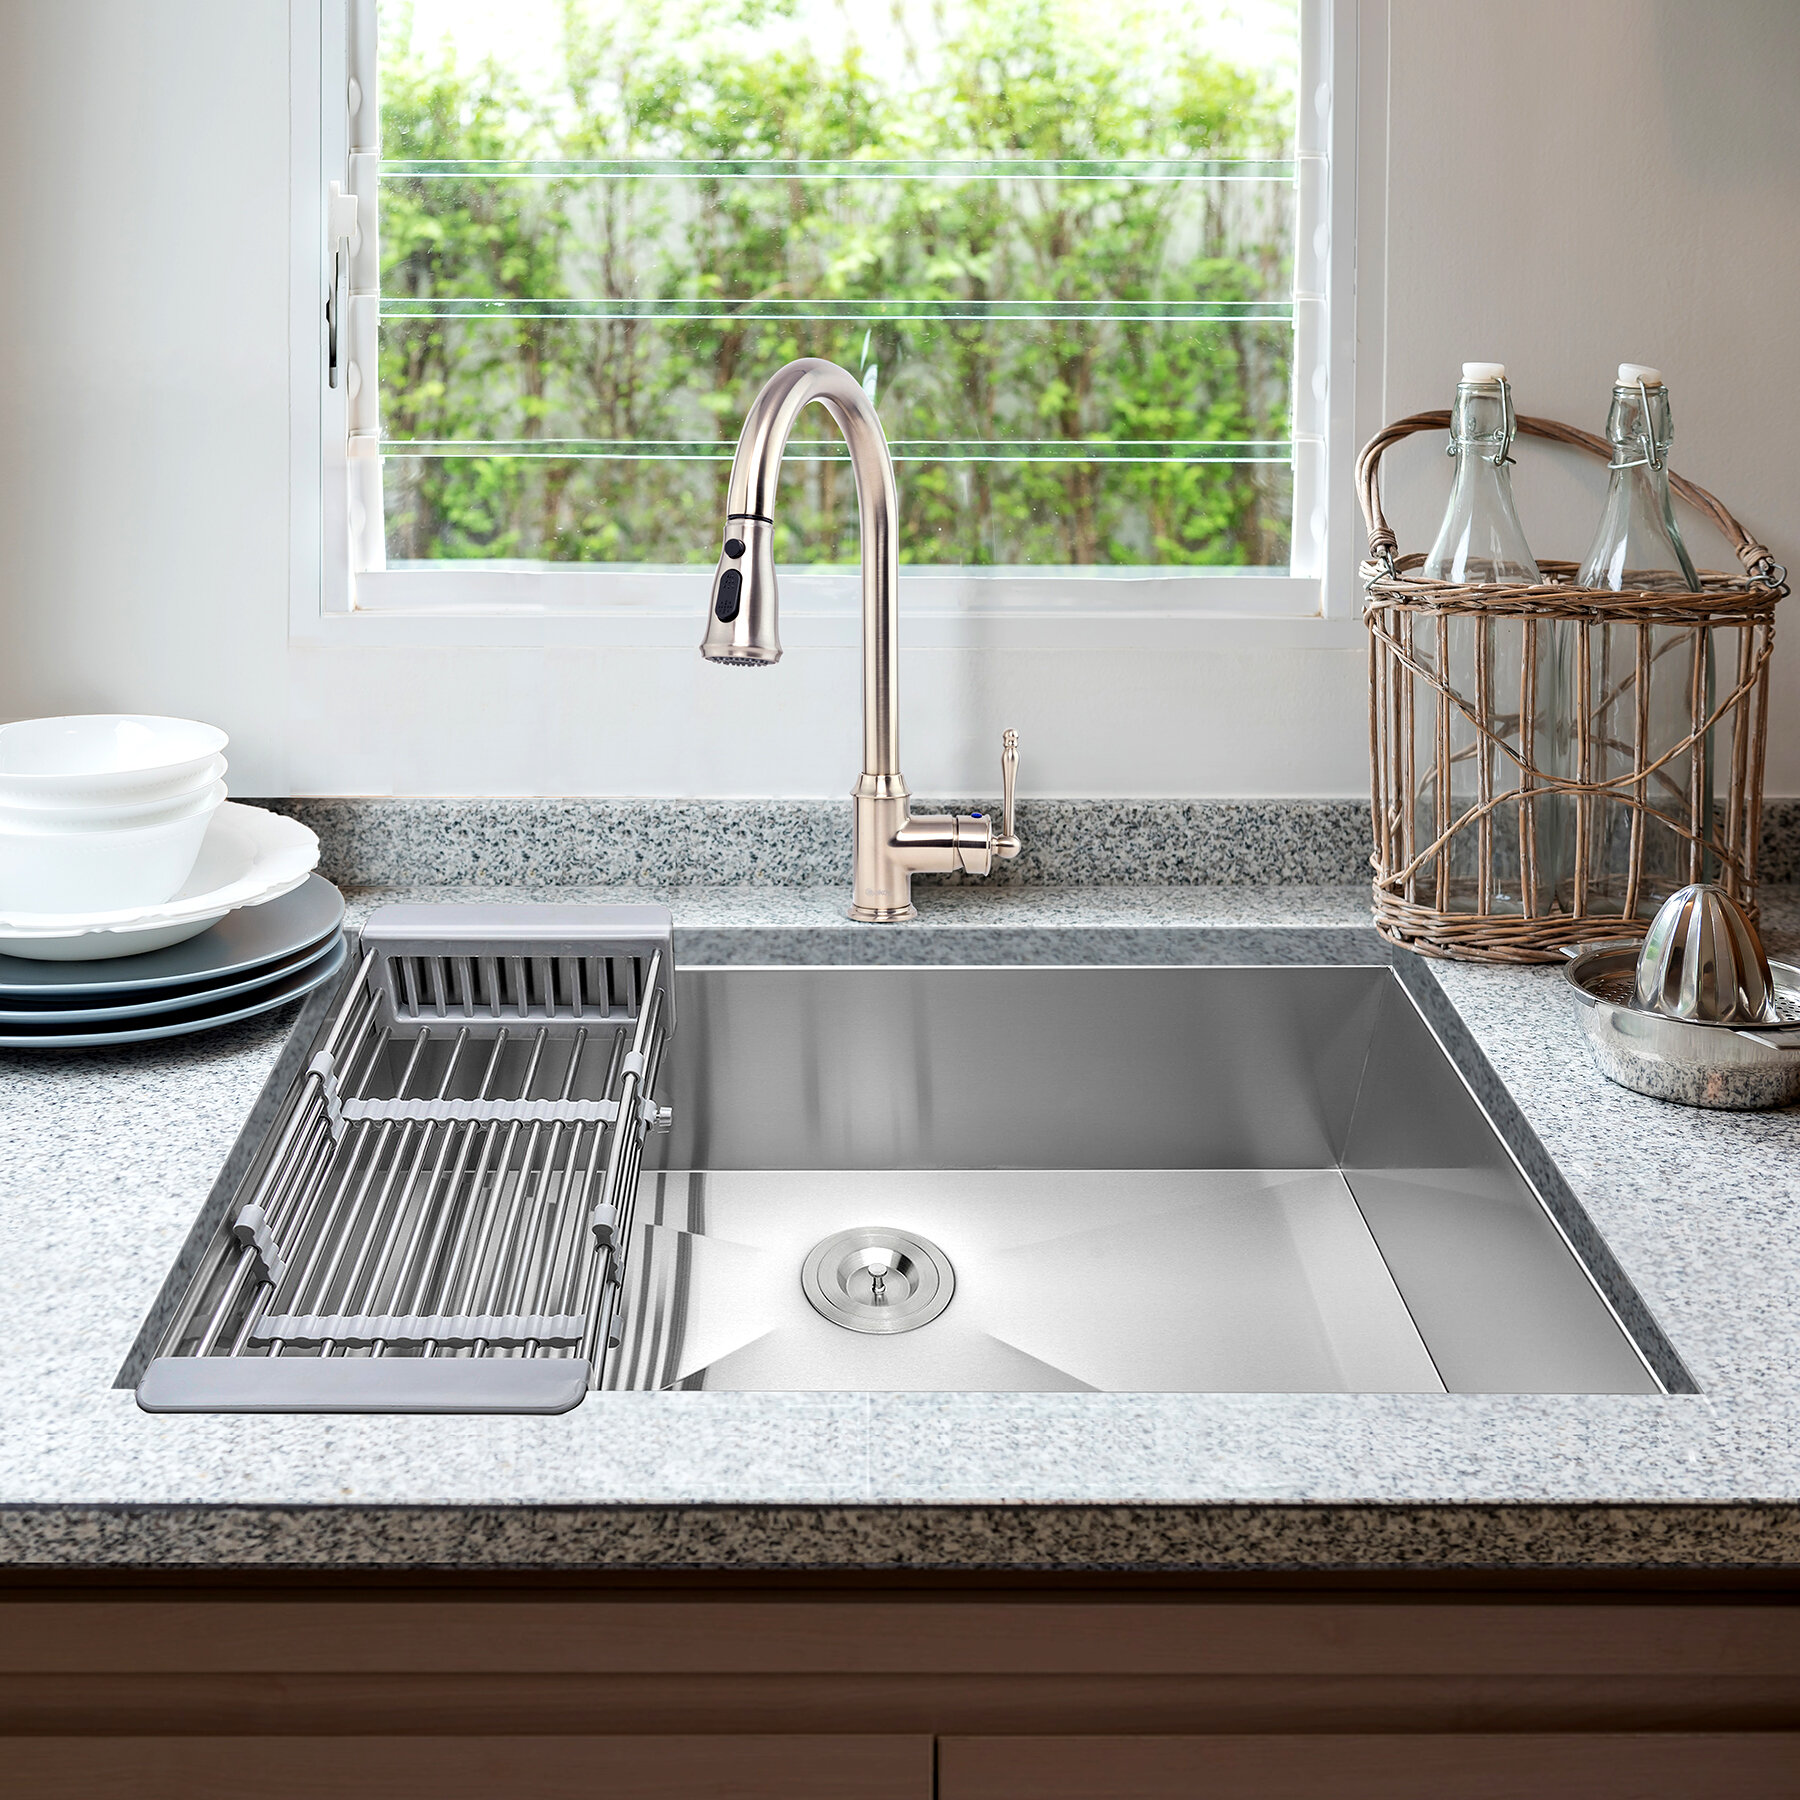 Akdy 33 L X 22 W Undermount Kitchen Sink With Faucet And Basket Strainer Wayfair